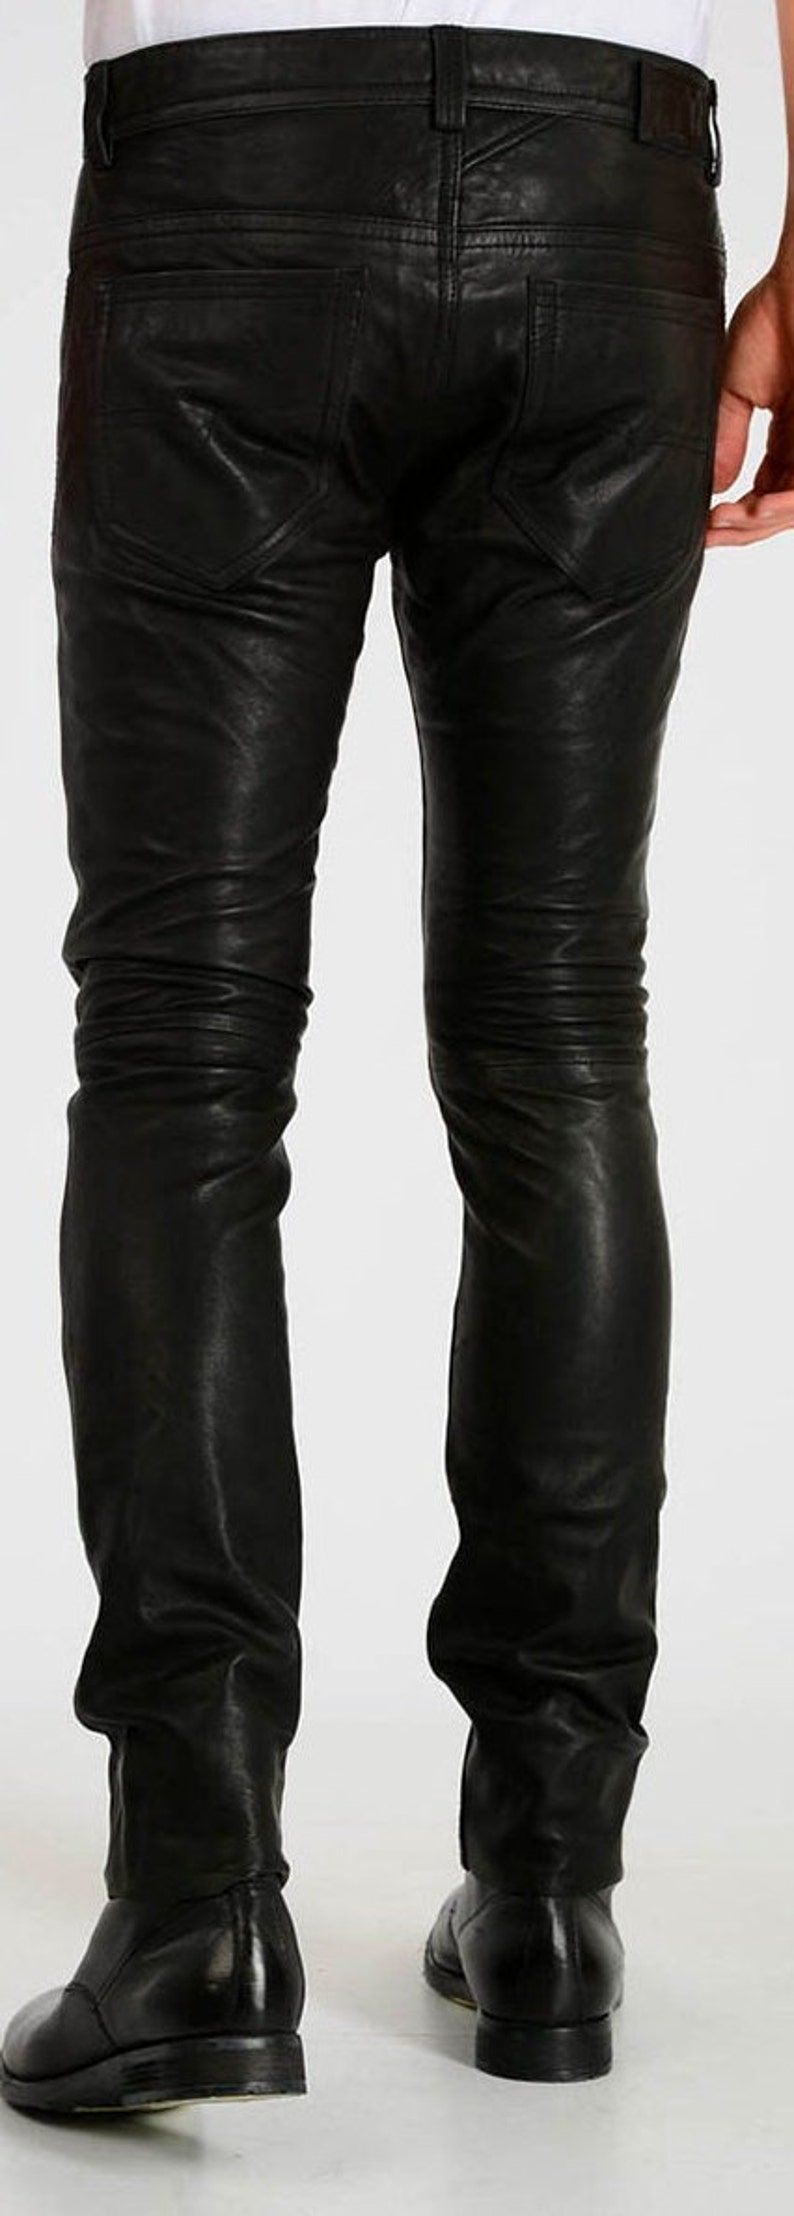 Men/'s Genuine Leather Black Trouser jeans